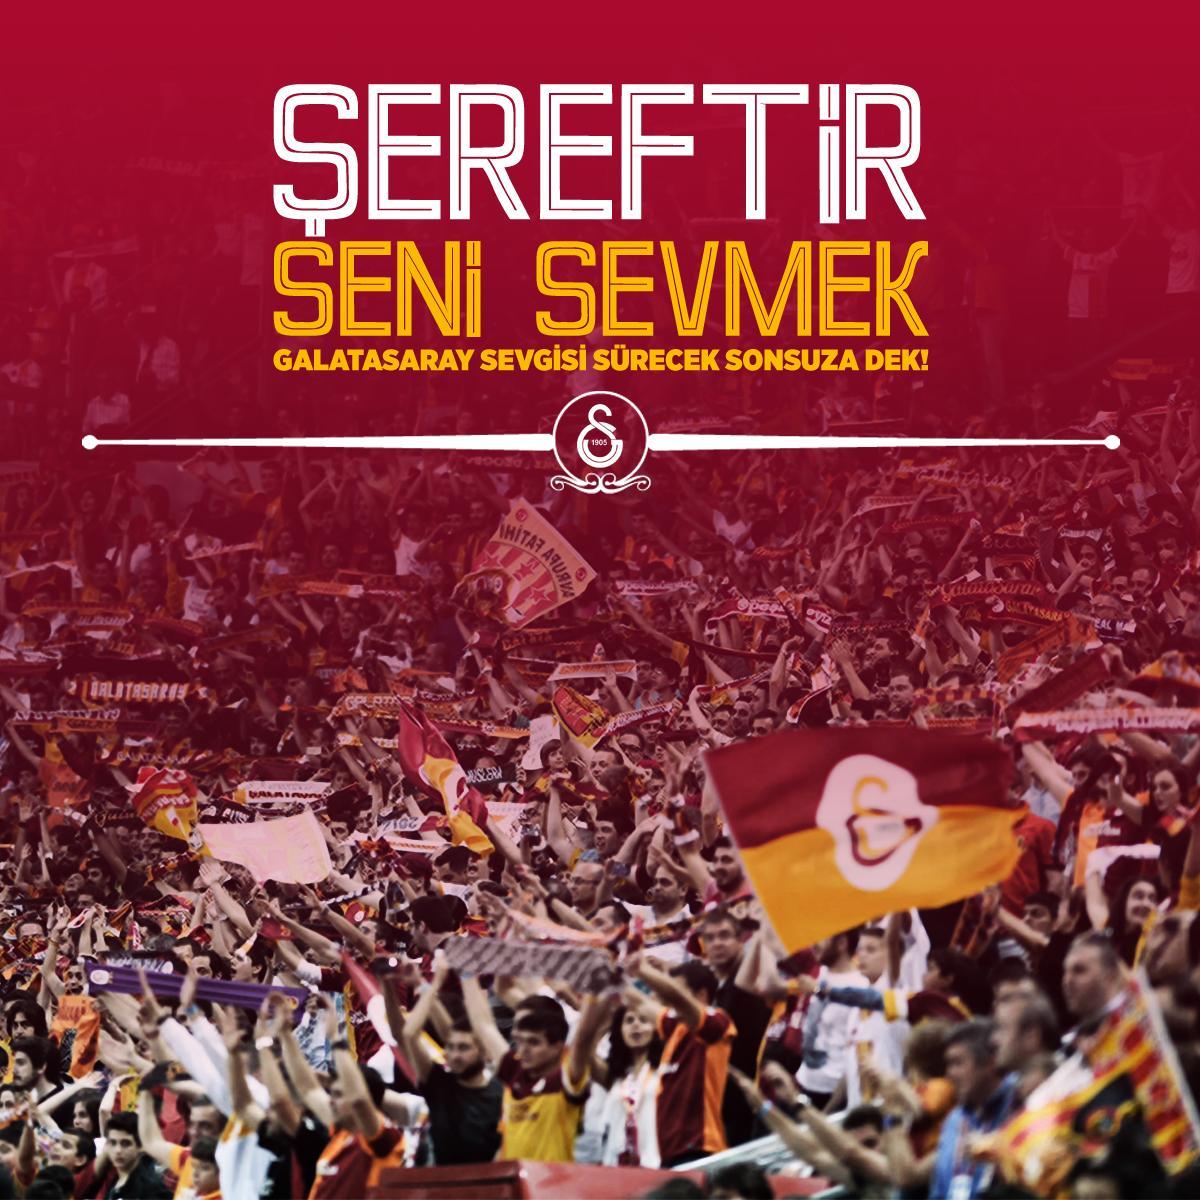 Galatasaray SK (@GalatasaraySK): ŞEREFTİR SENİ SEVMEK http://t.co/Q2knUrJgO6